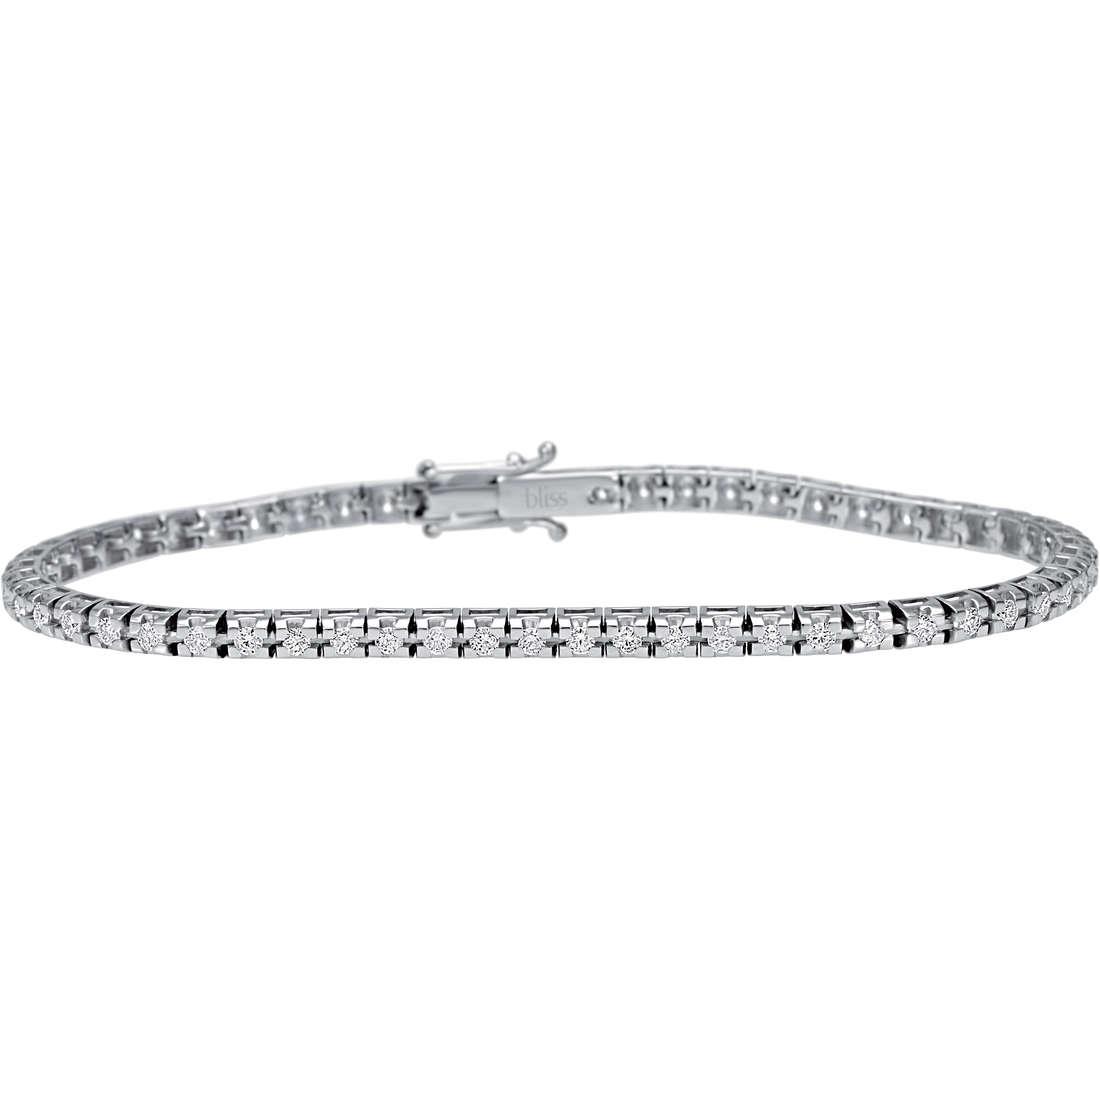 bracelet woman jewellery Bliss First class 20061017